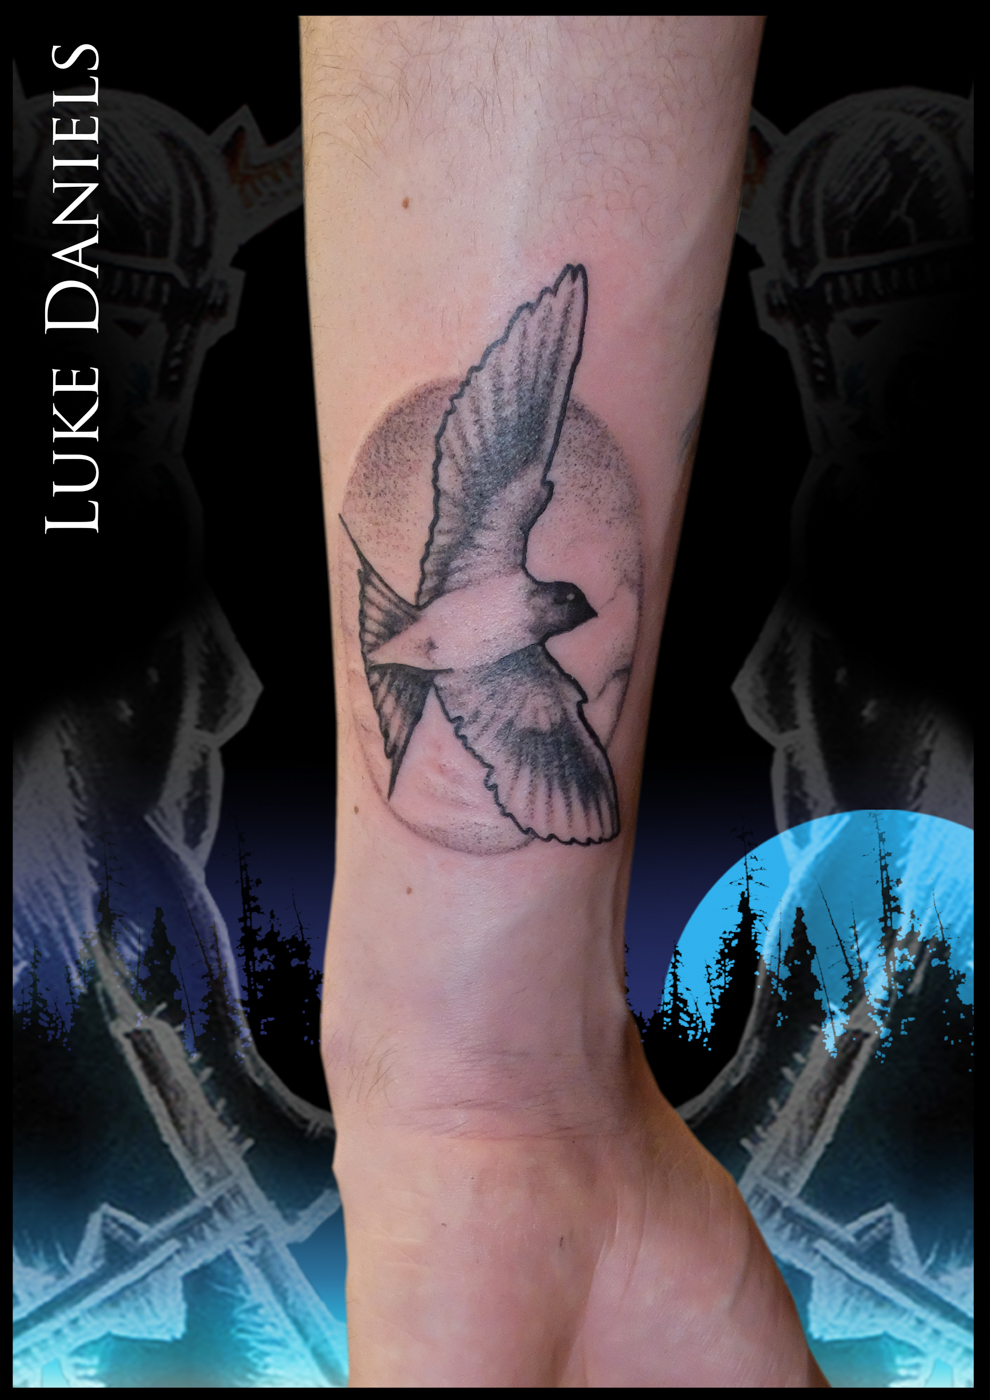 oxfordshire-tattoo-studio-6.jpg